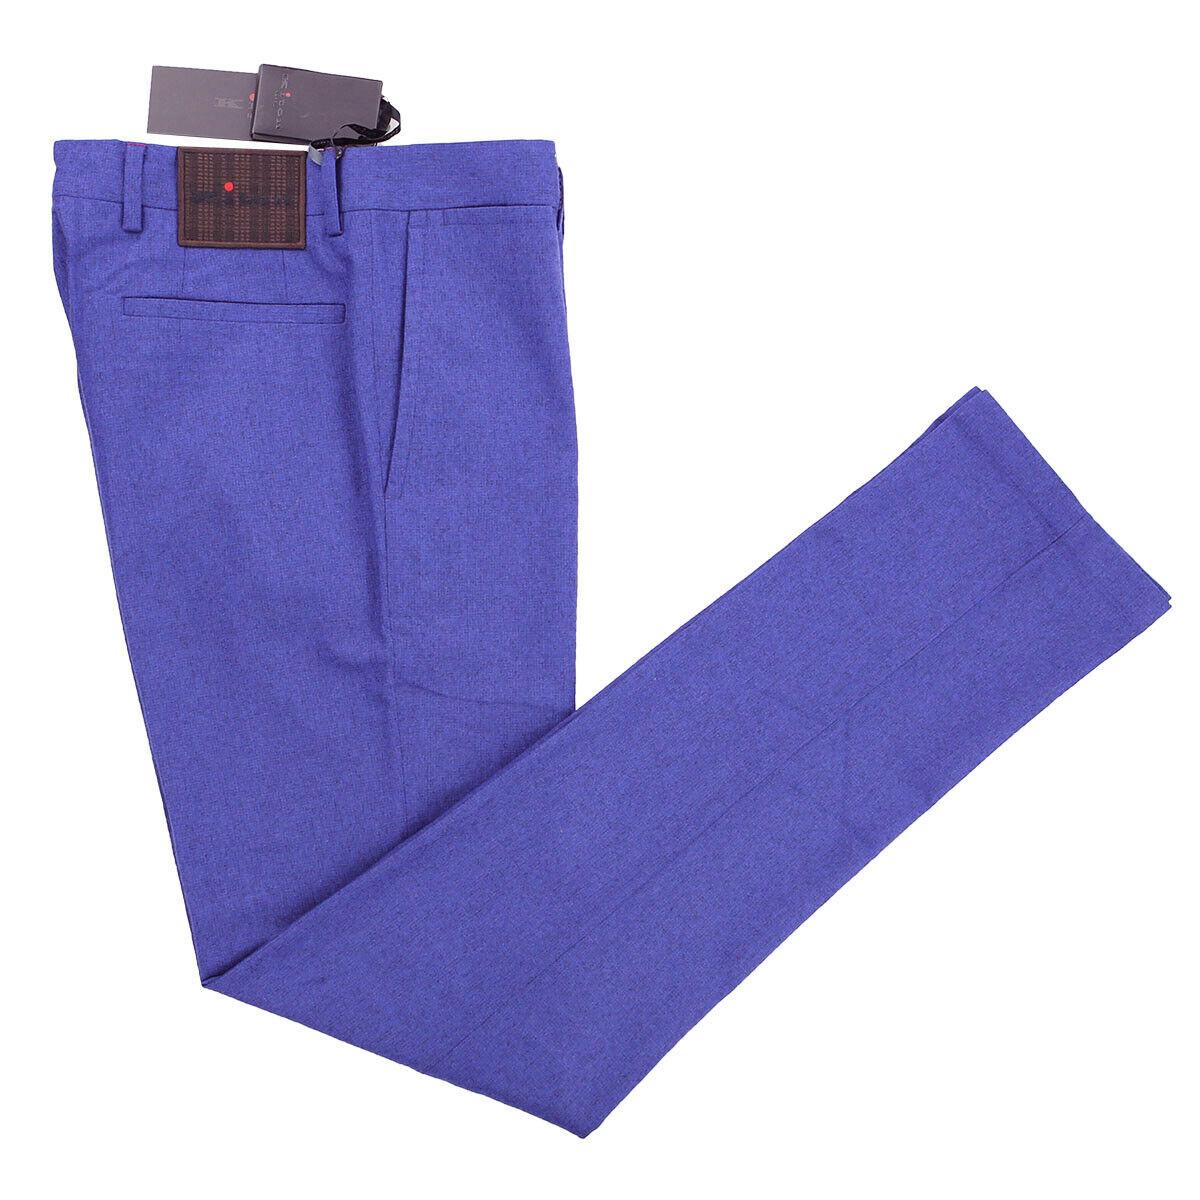 NEW KITON DRESS PANT WOOL CASHMERE AND EA SIZE 29 US 45 EU UFPP79 19OJ439